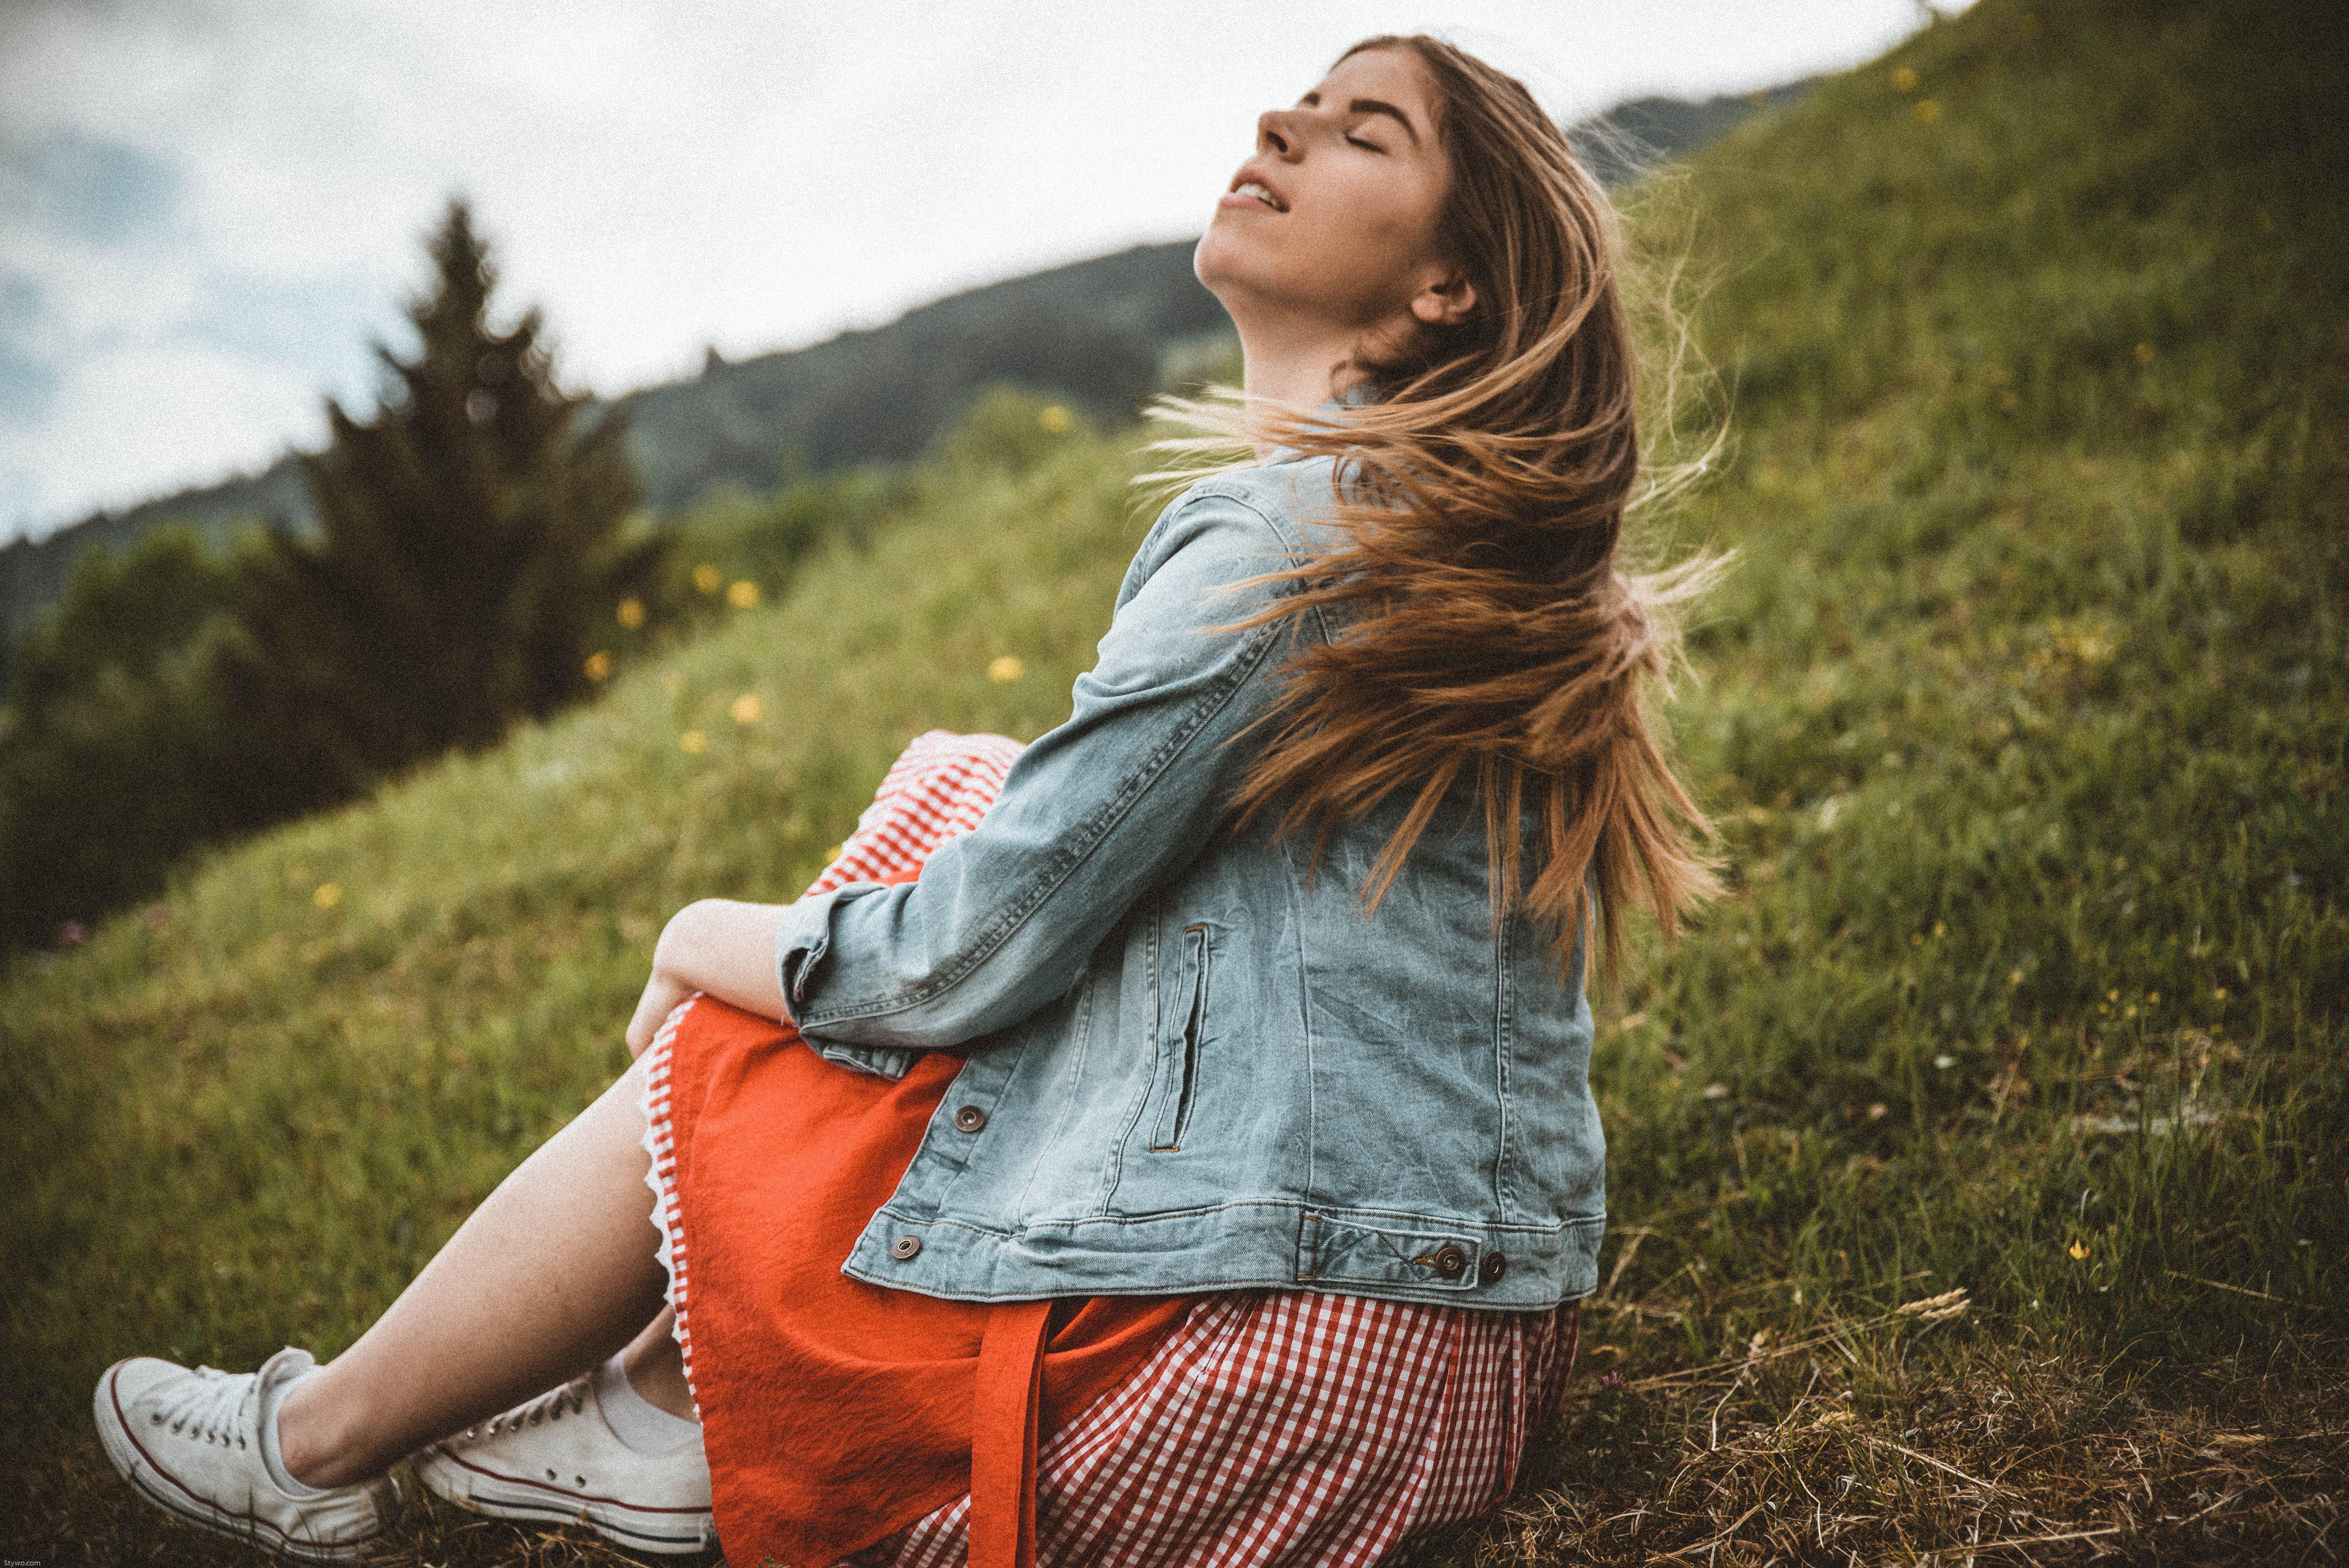 Woman Wearing Blue Denim Jacket Sitting on Green Grass Near Trees Under Blue Sky at Daytime